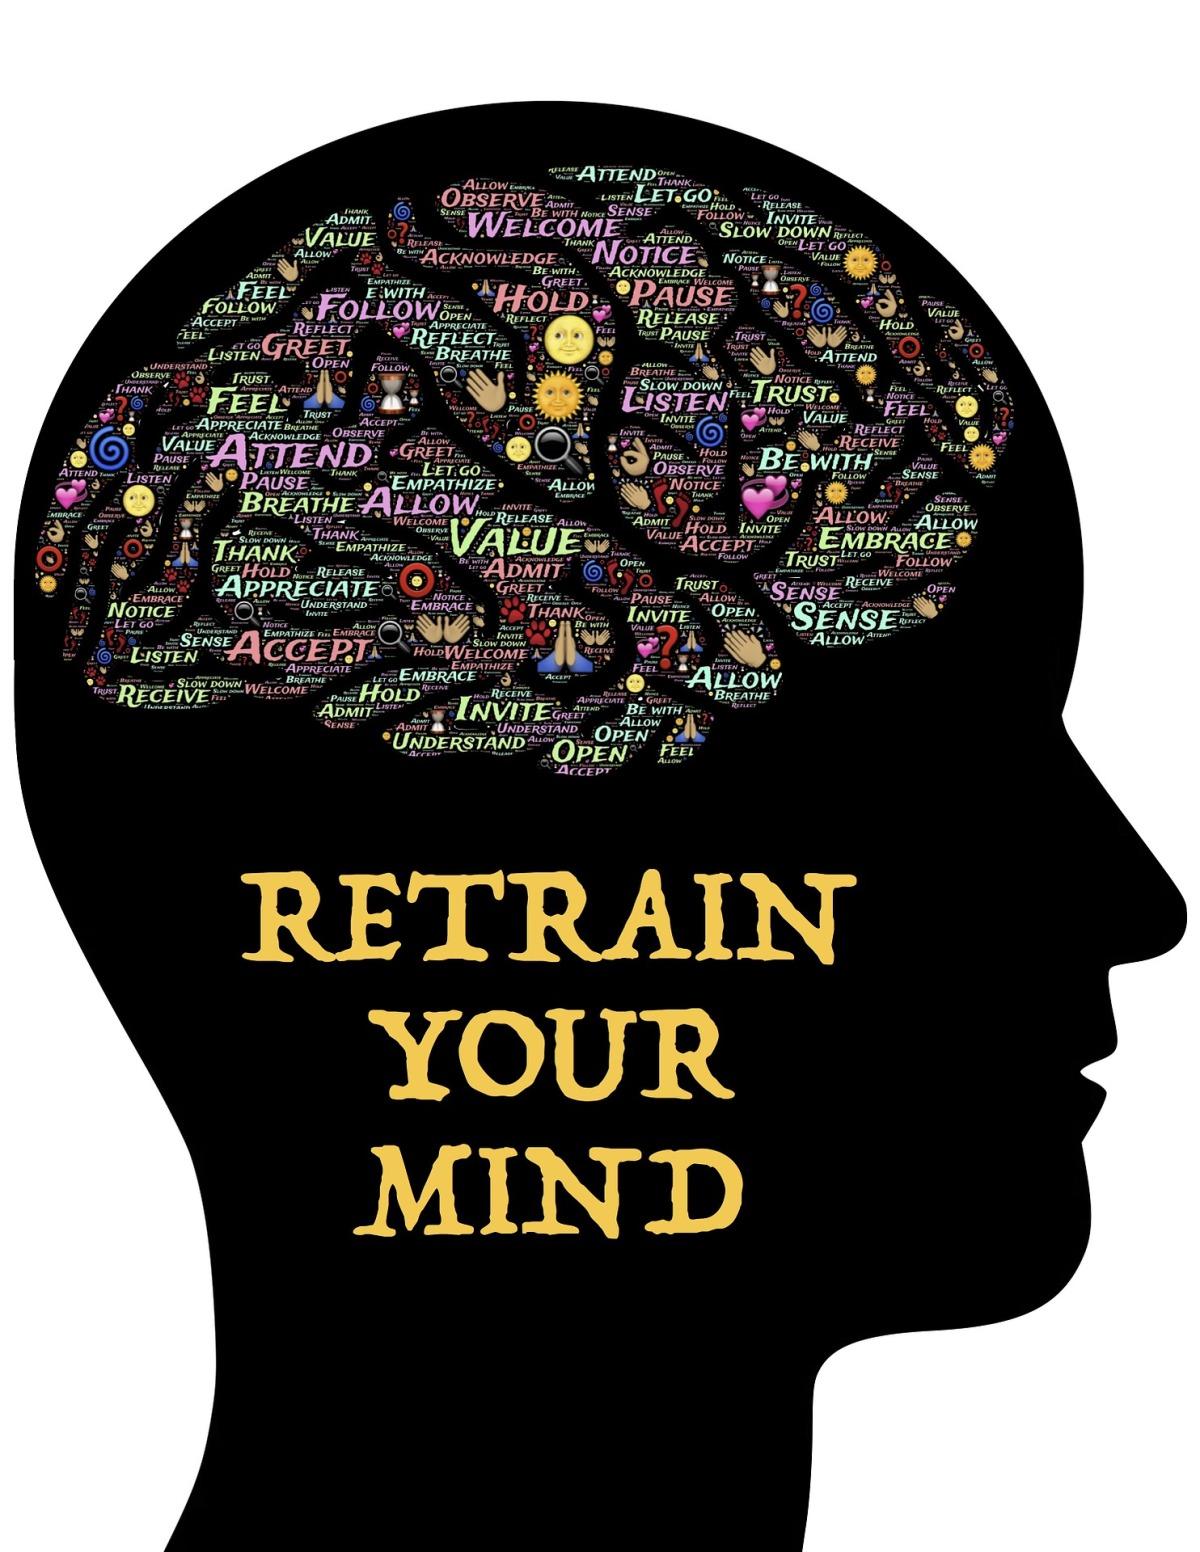 Reset your Mindset